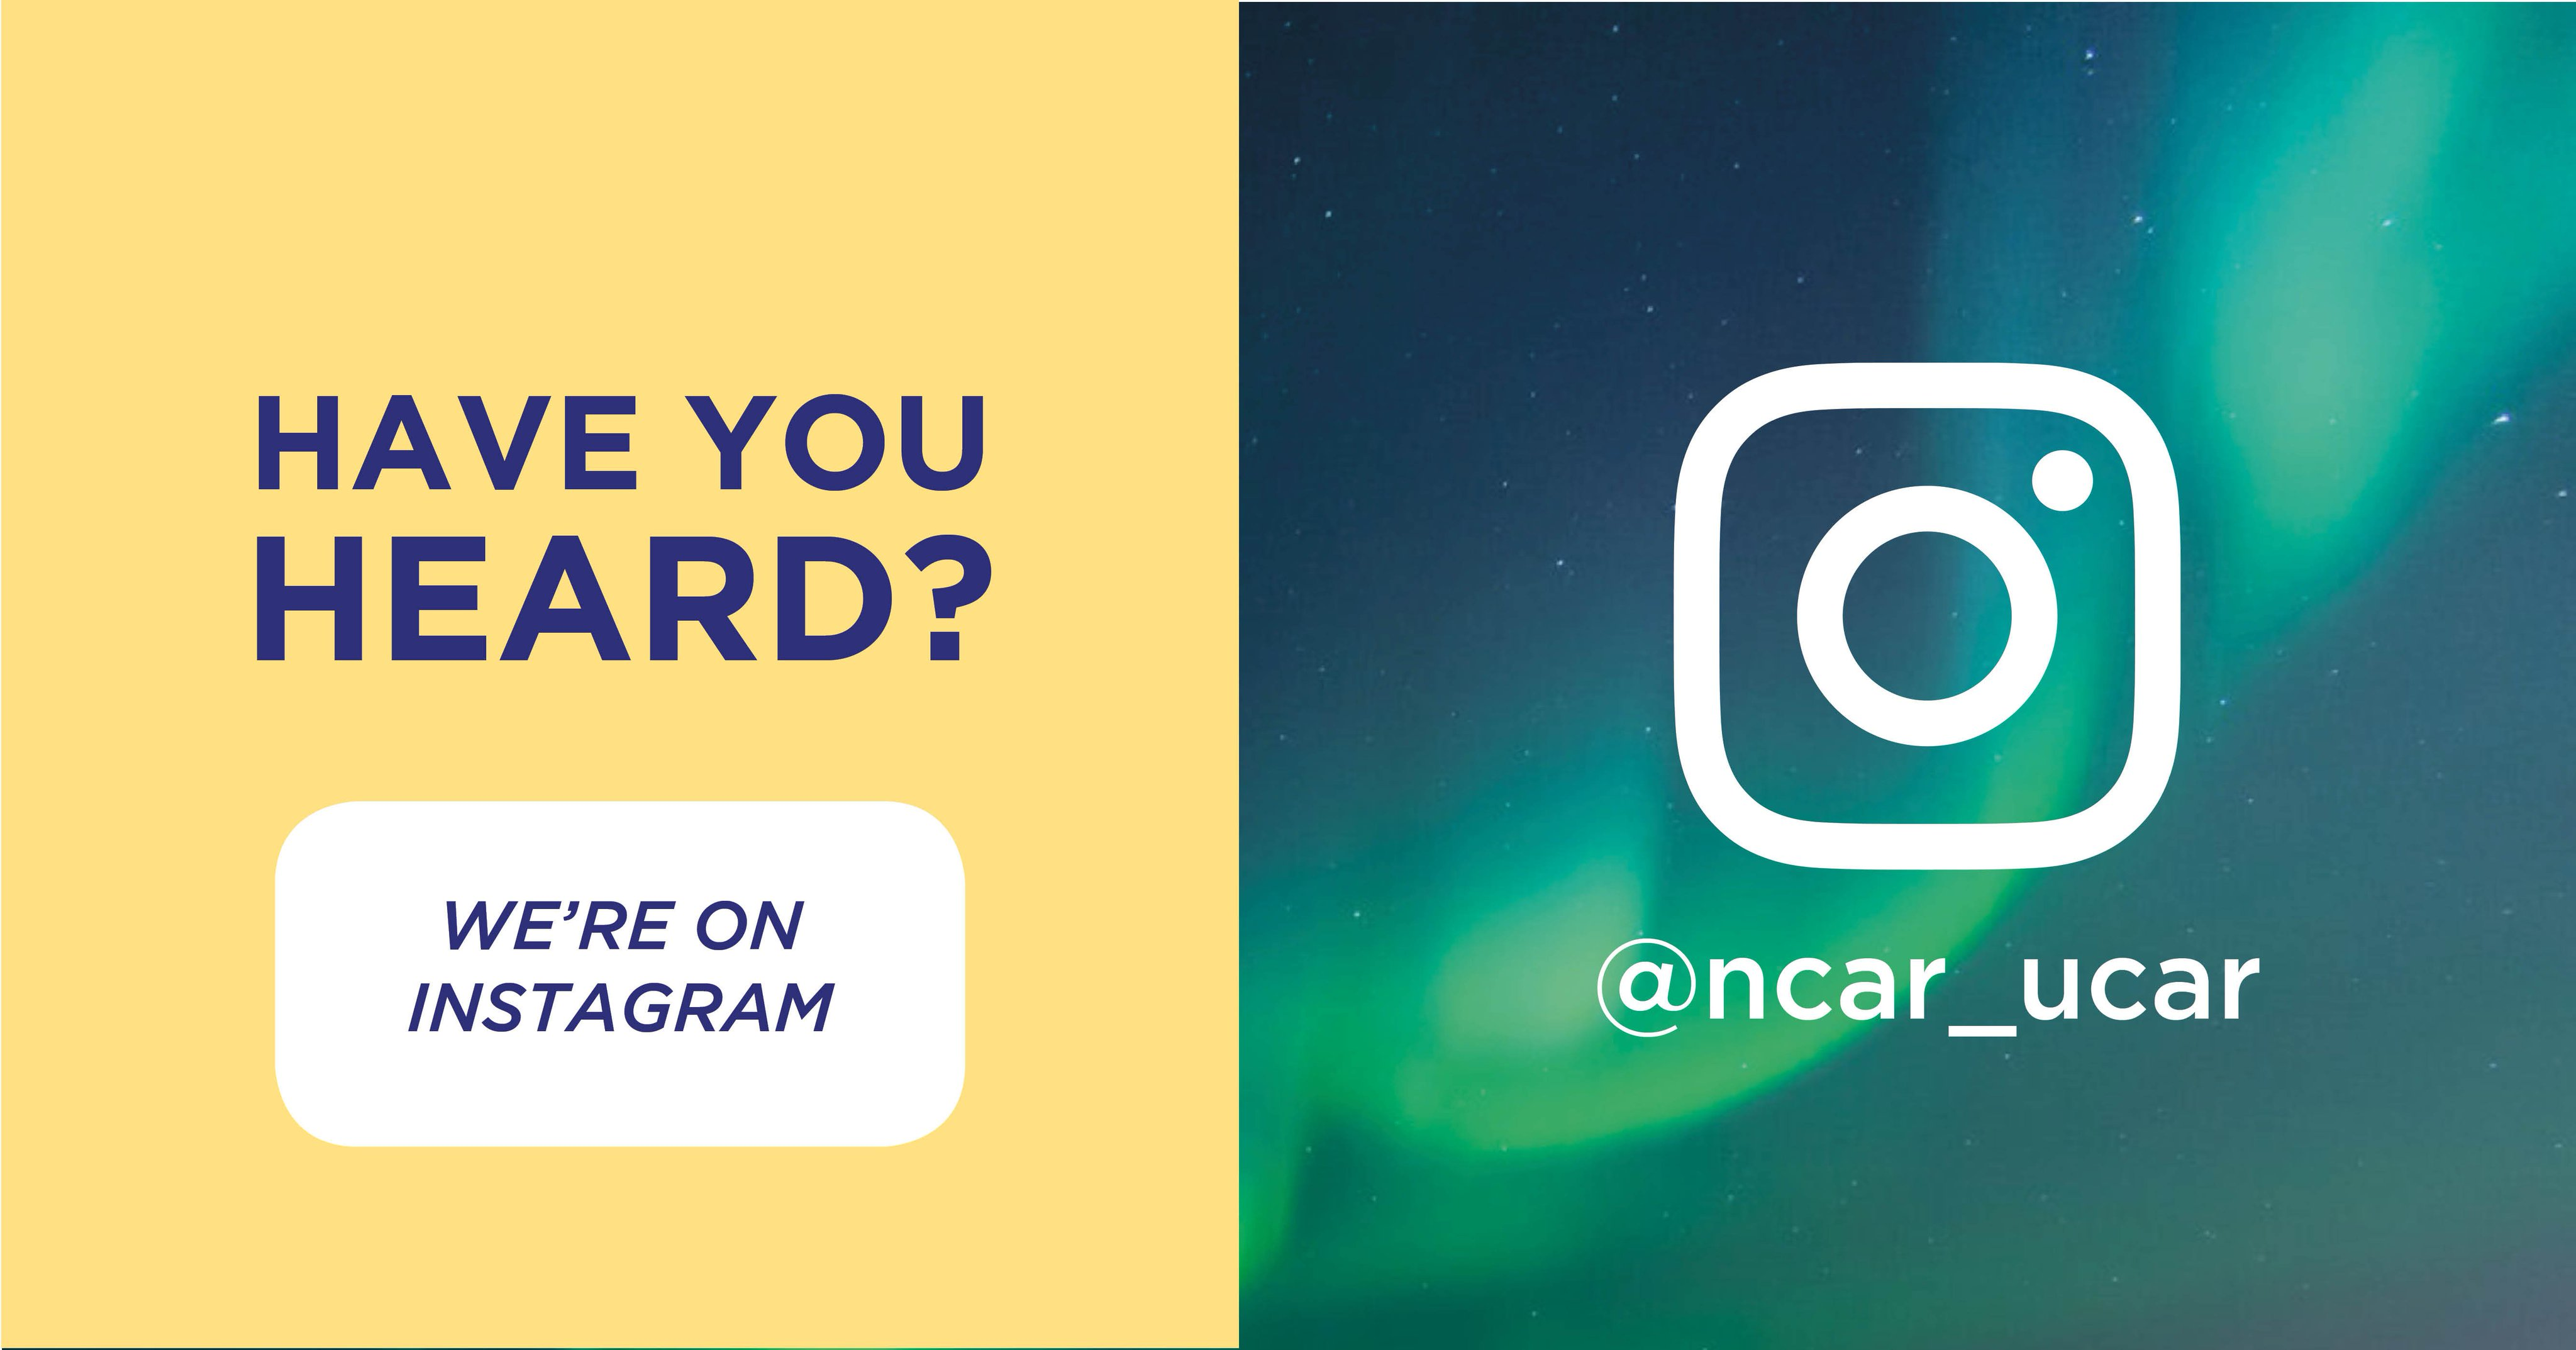 Have you heard? We're in instagram